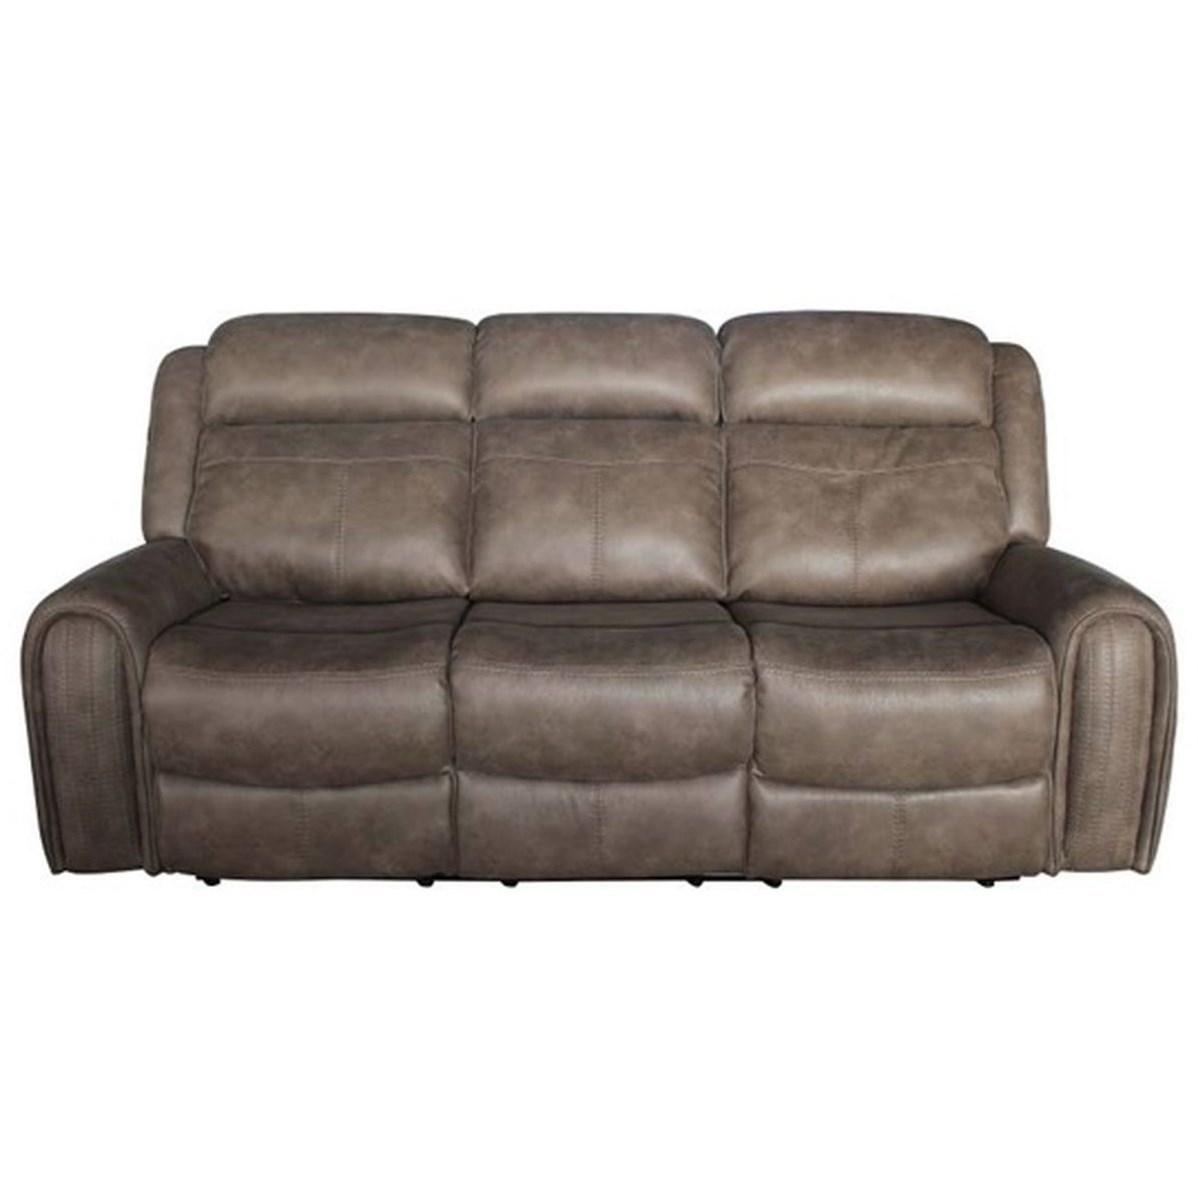 Lifestyle U61493Power Motion Sofa With 2 Power Headrests ...